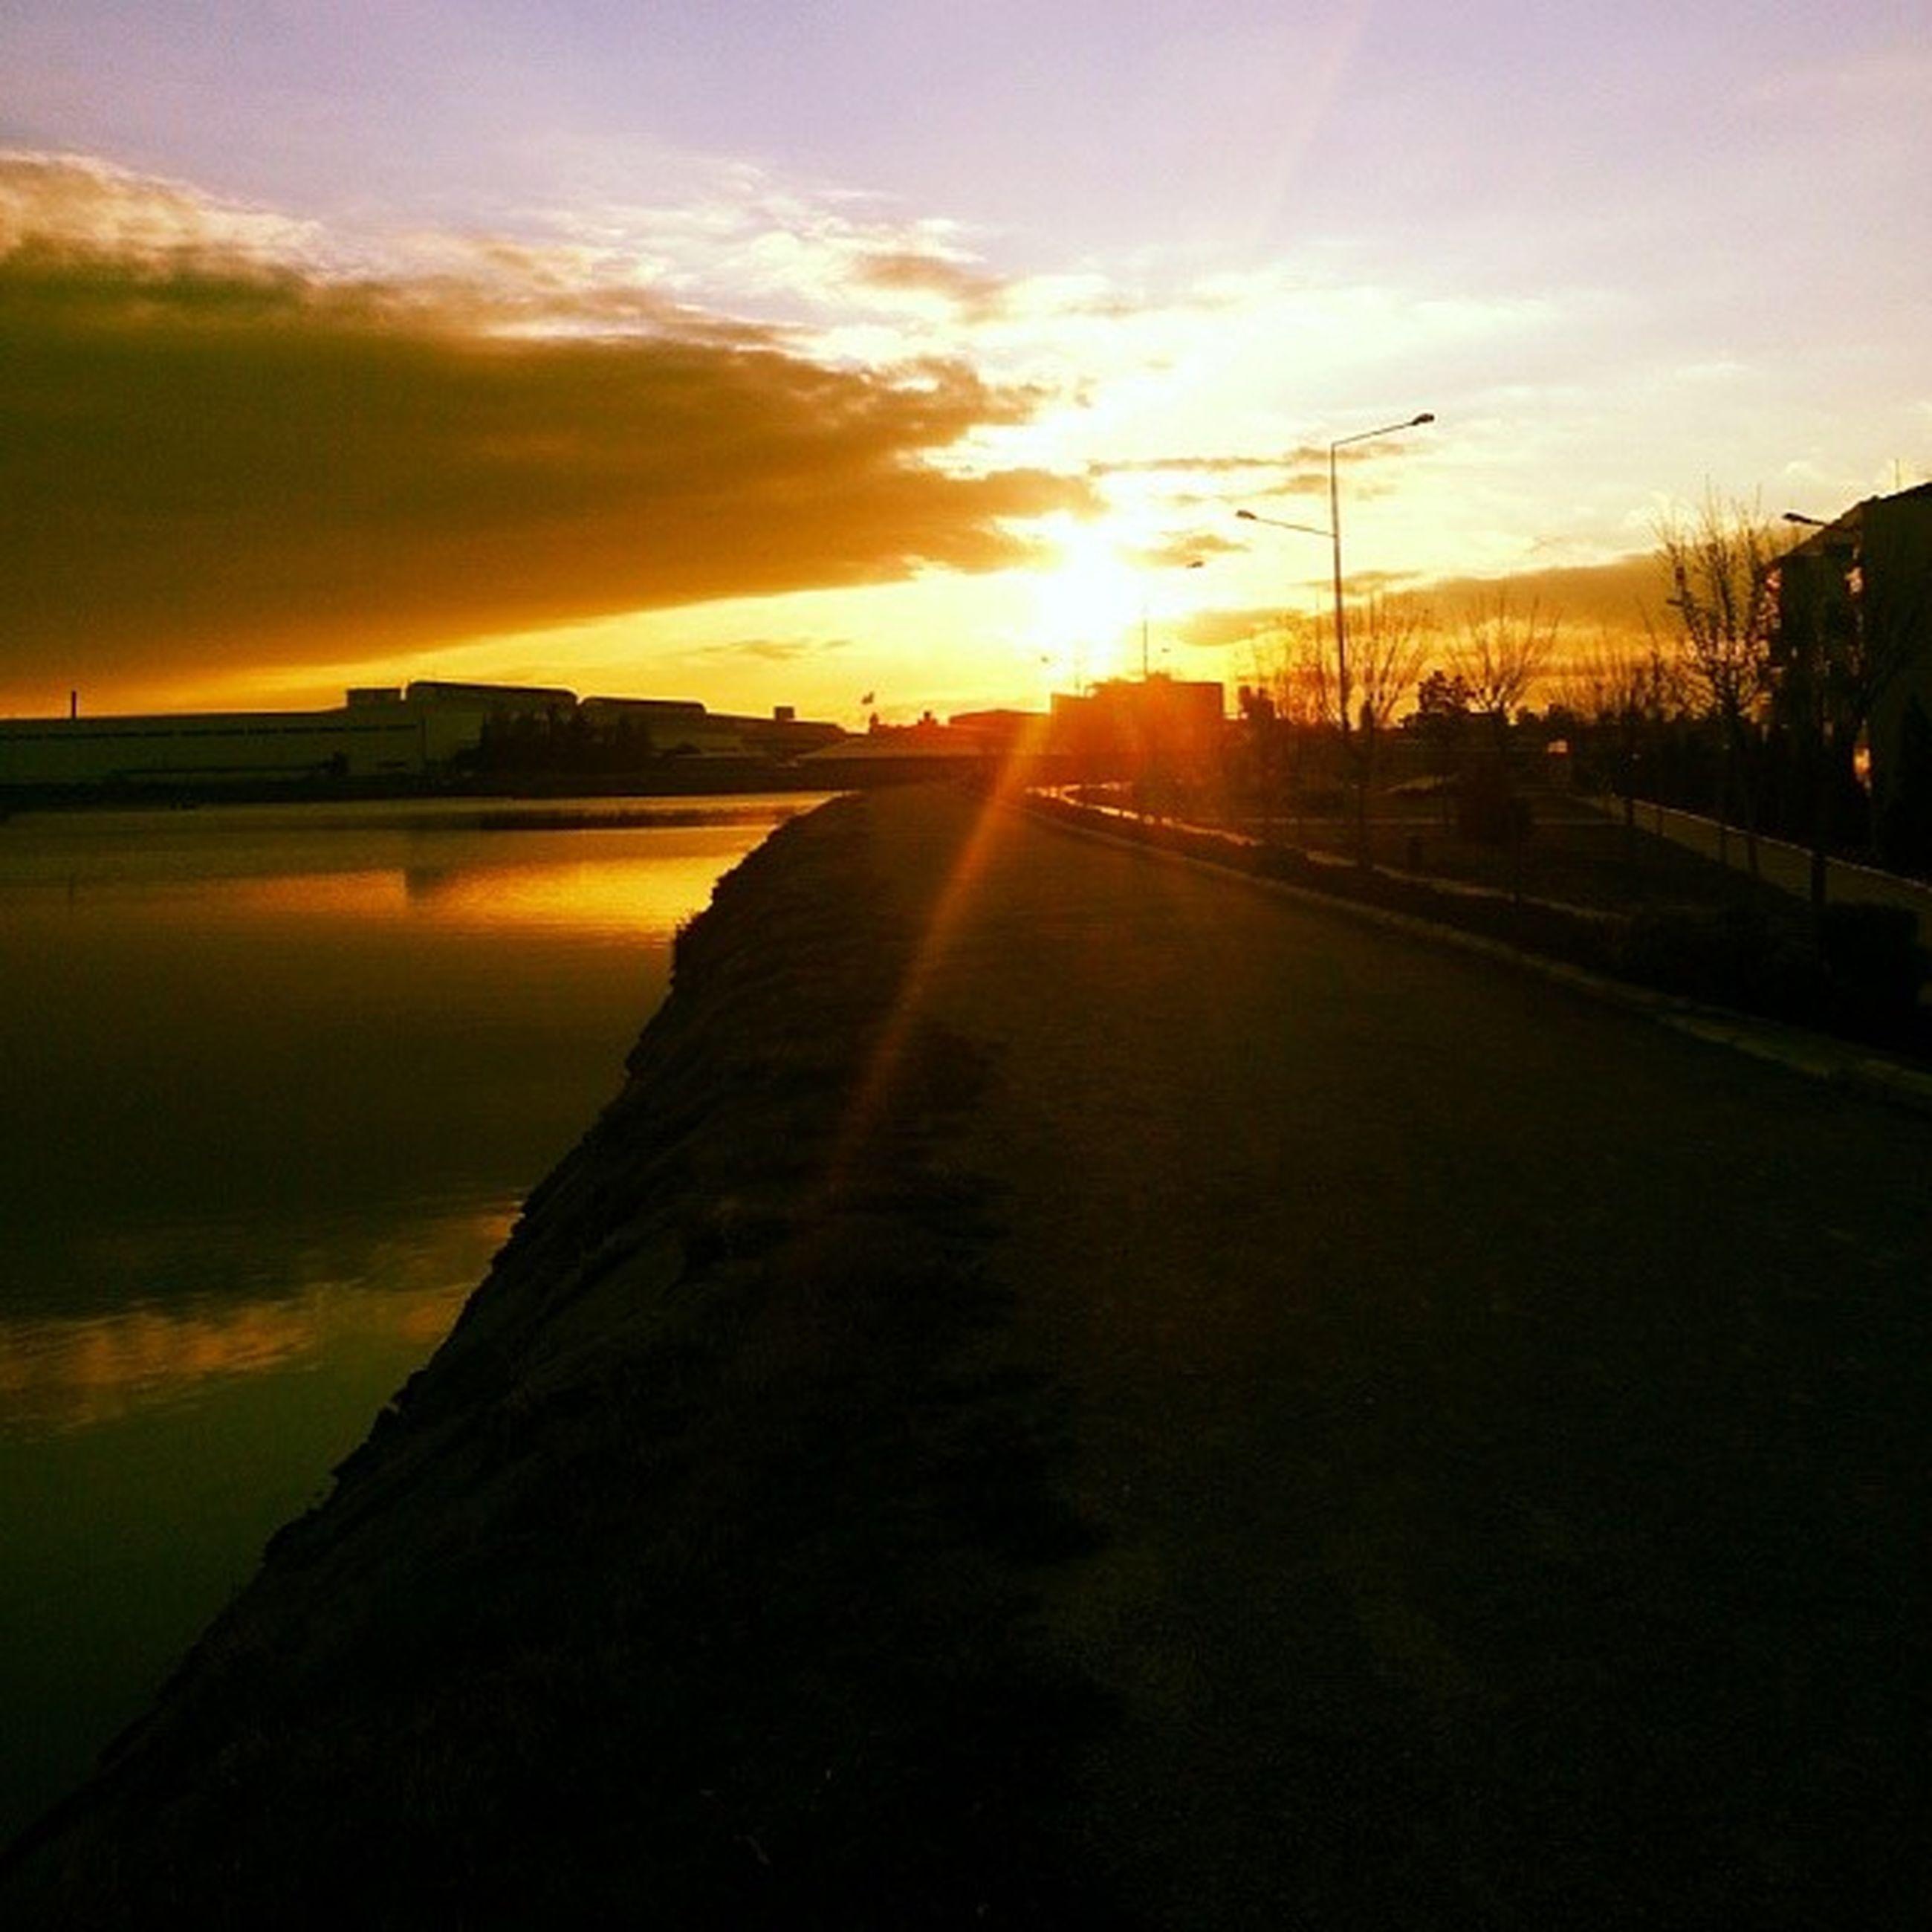 sunset, sun, orange color, water, sky, scenics, reflection, tranquil scene, sunlight, beauty in nature, silhouette, tranquility, sunbeam, lens flare, nature, idyllic, river, cloud - sky, sea, lake